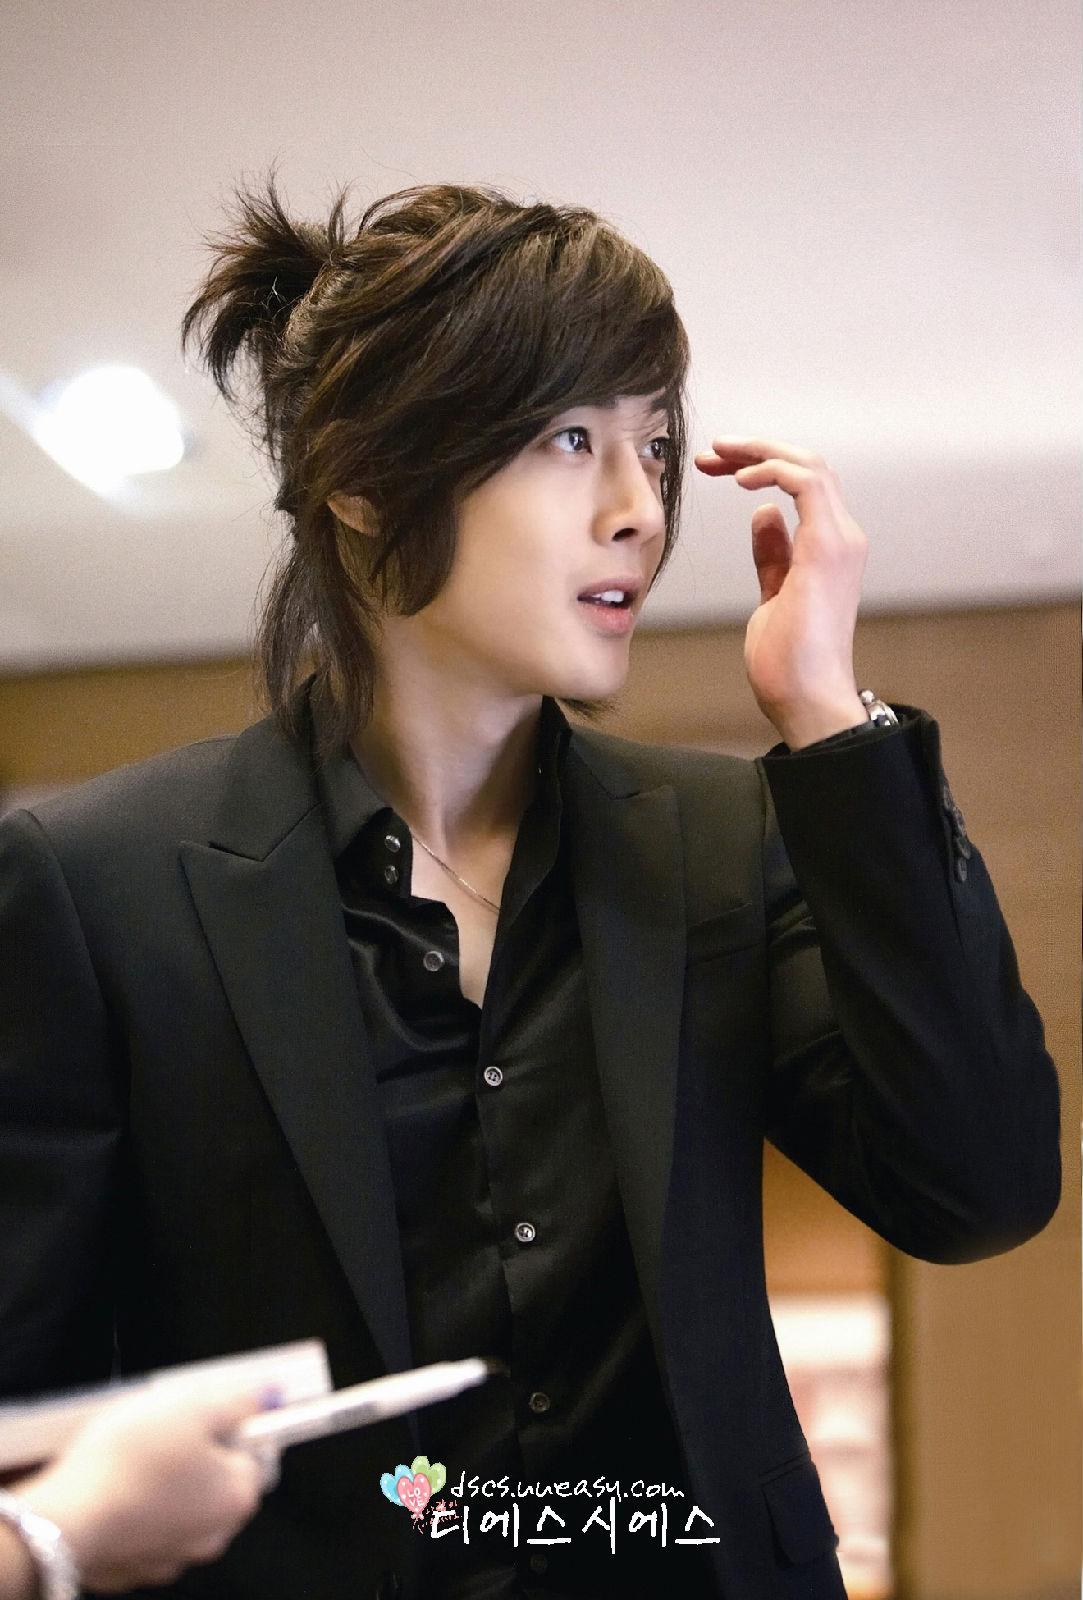 KeiBlade Updo Kim Hyun Joong